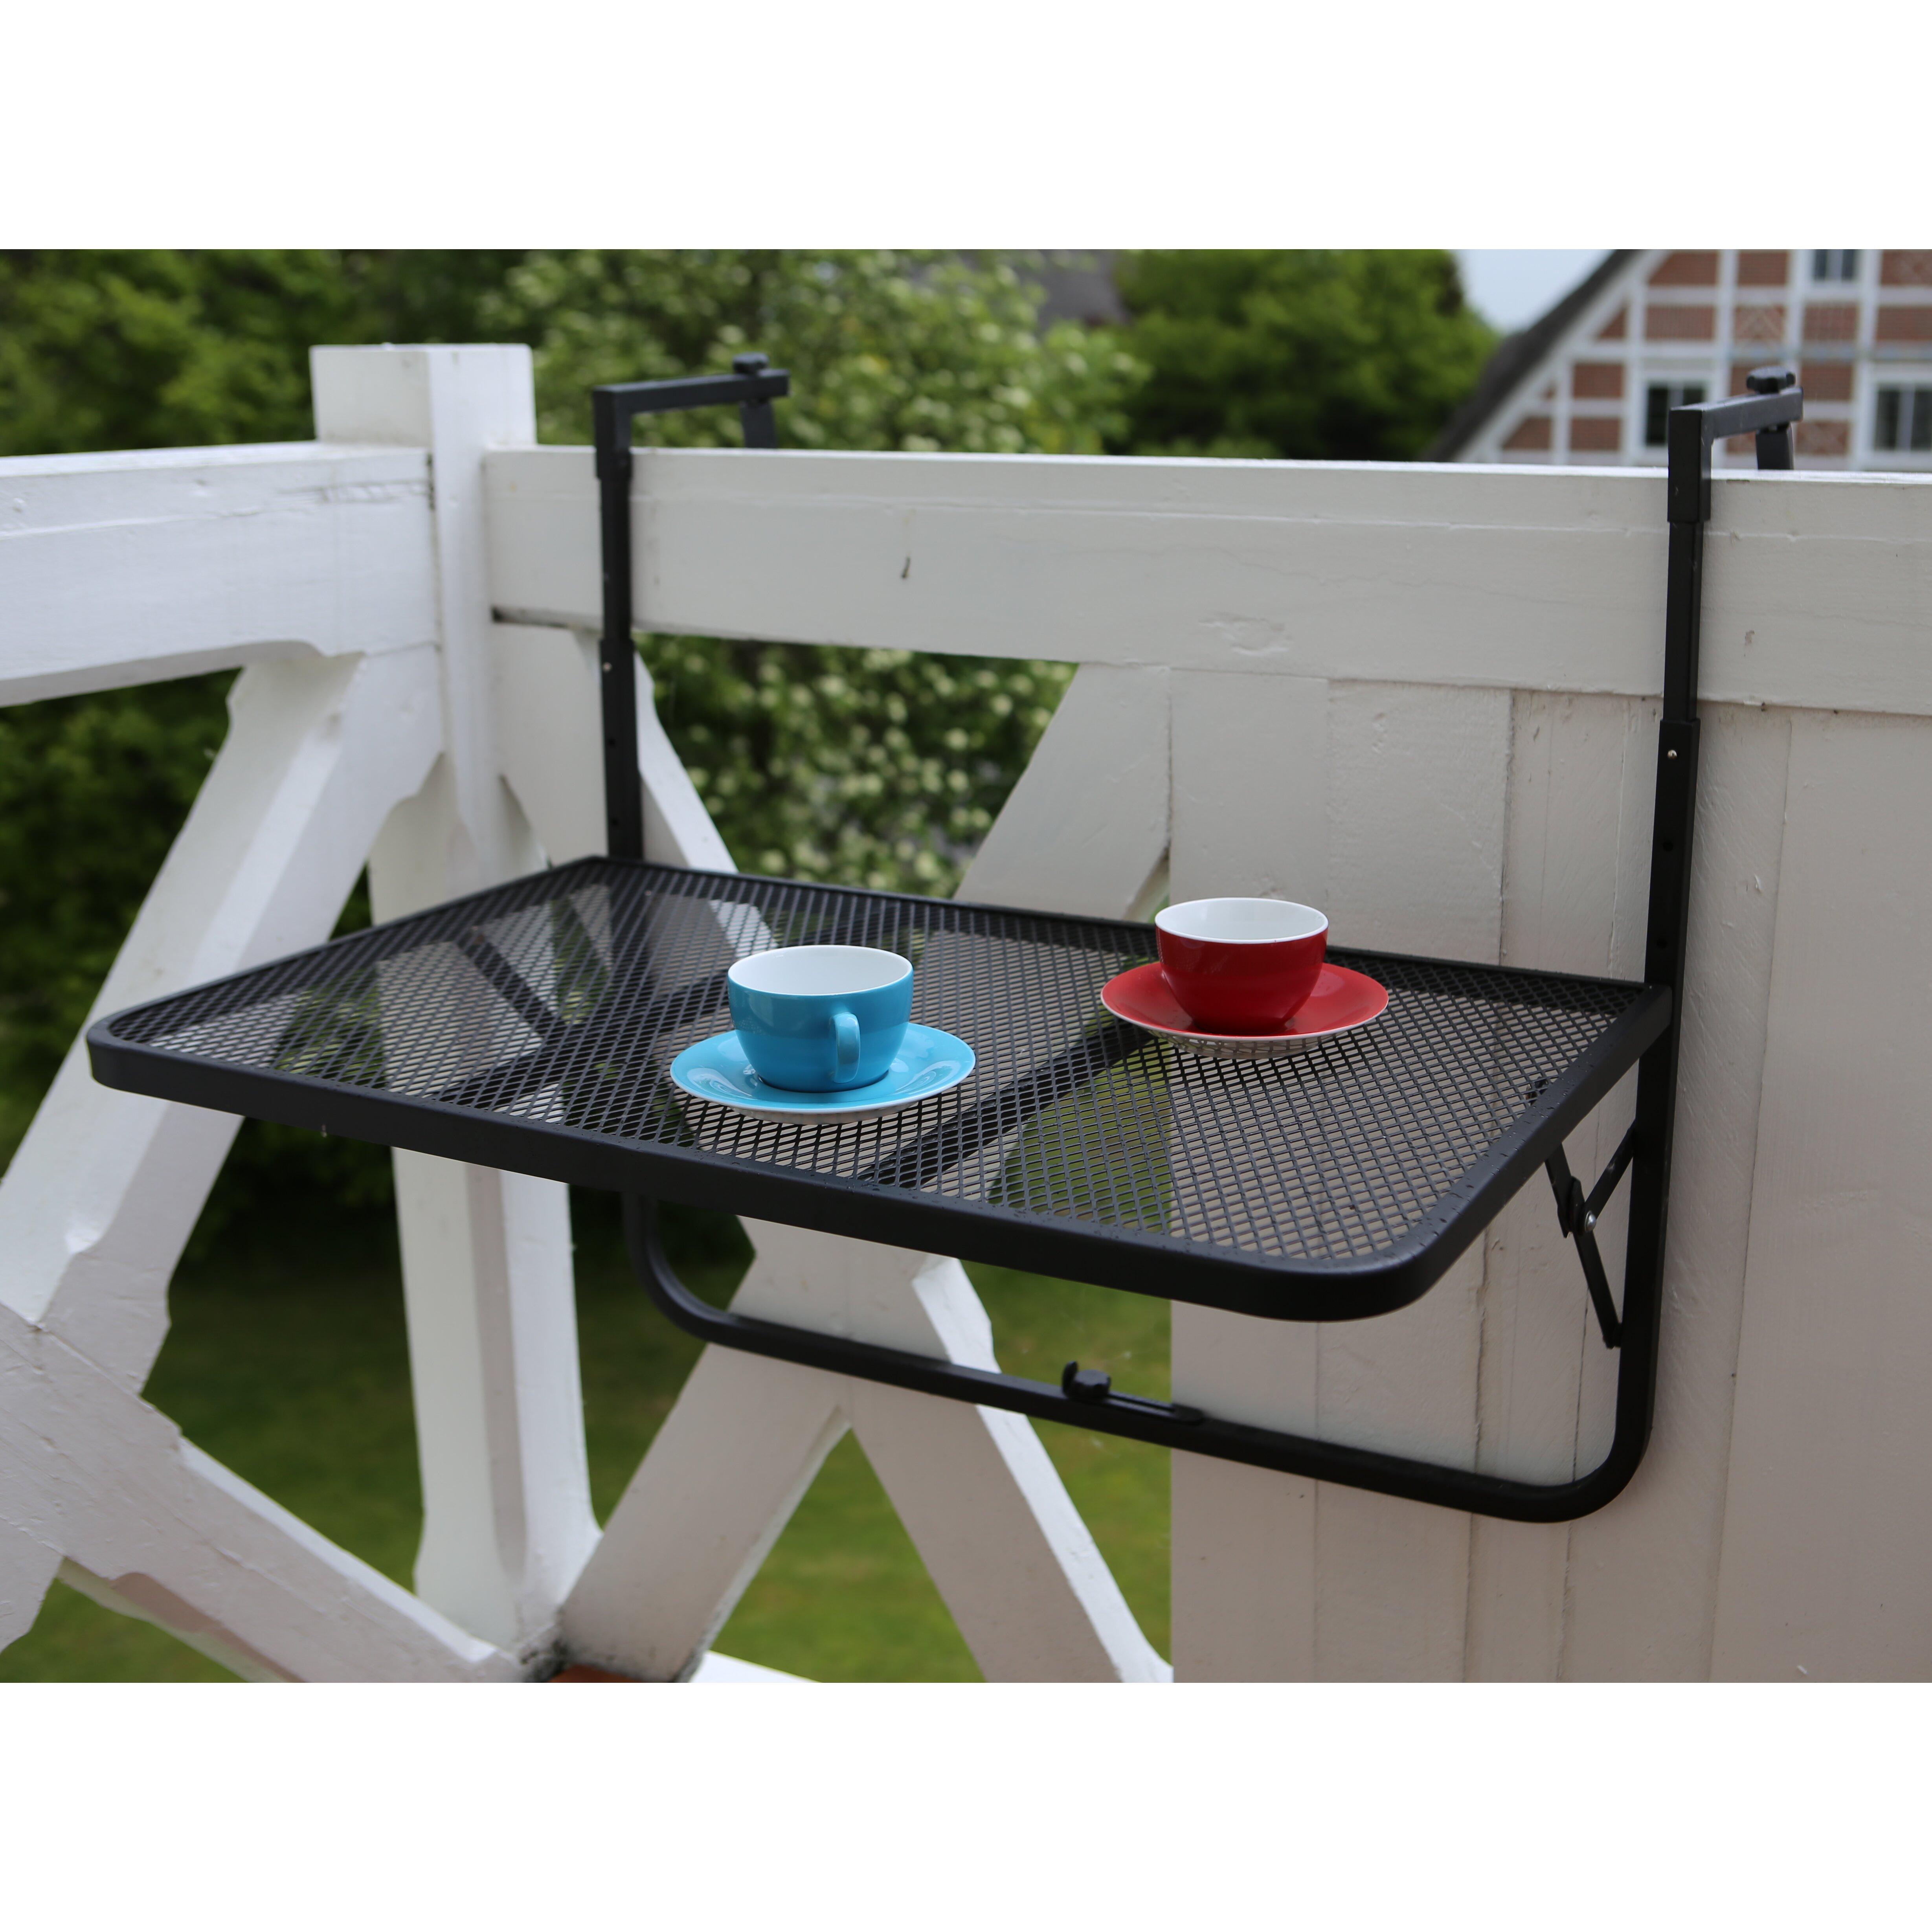 destiny klappbarer balkontisch genua bewertungen. Black Bedroom Furniture Sets. Home Design Ideas